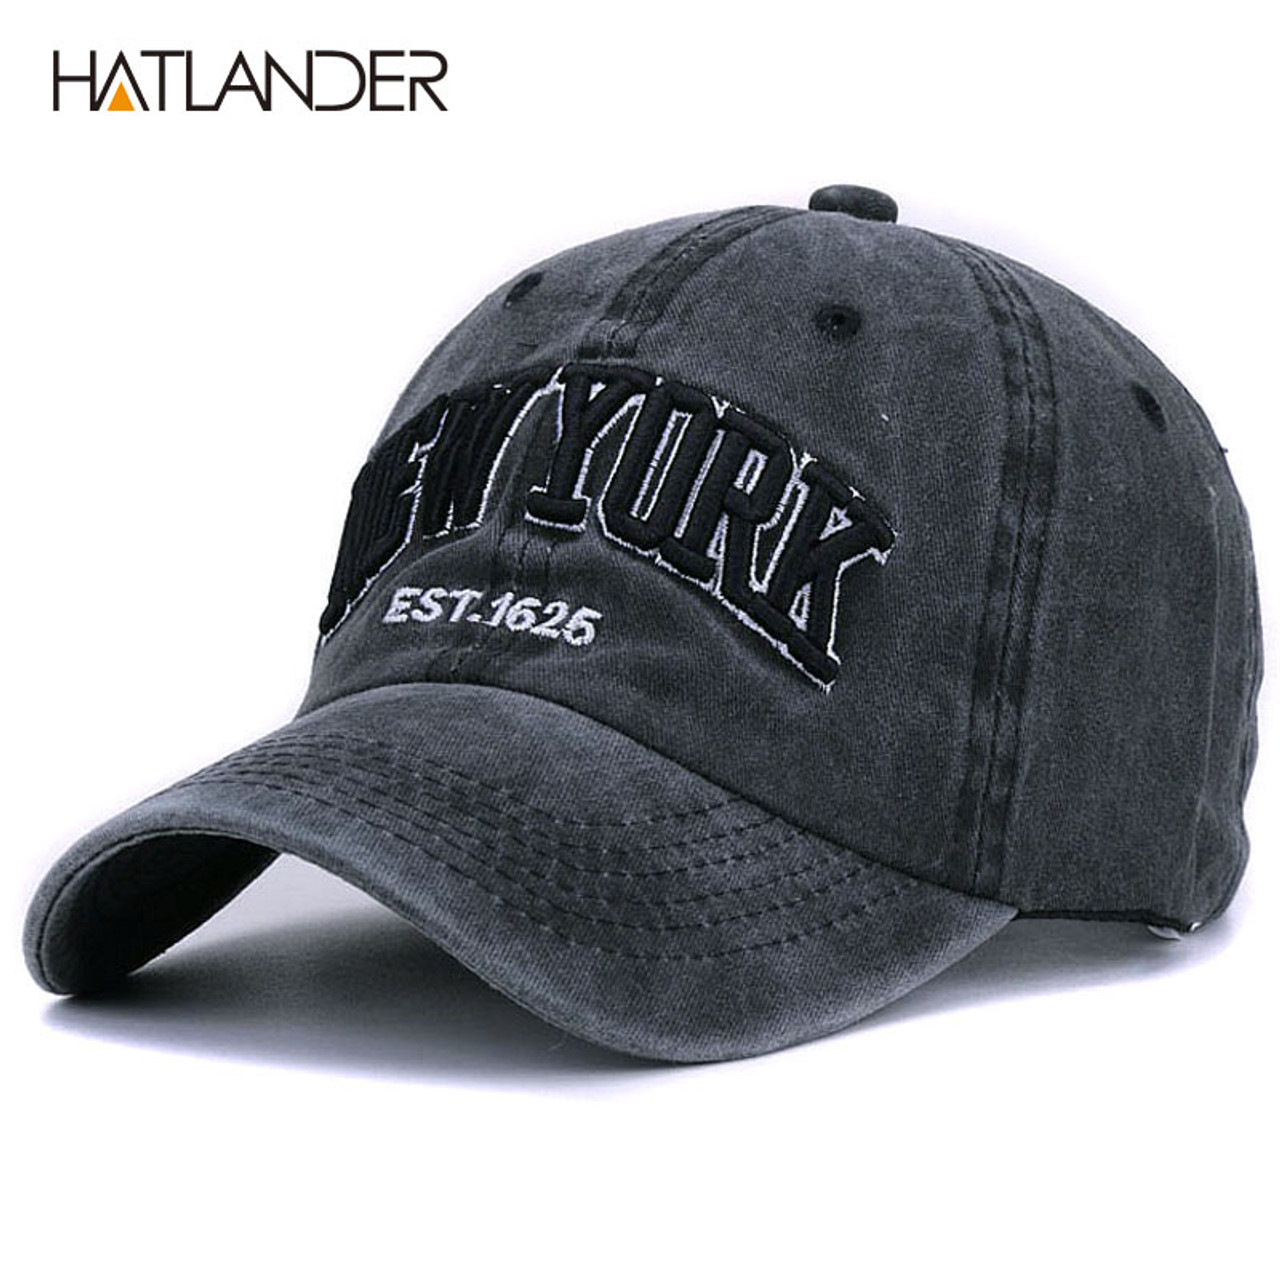 Vintage Men Baseball Caps Dad Women Caps Hats for Men Embroidery Baseball Hat Adjustable Cotton Cap